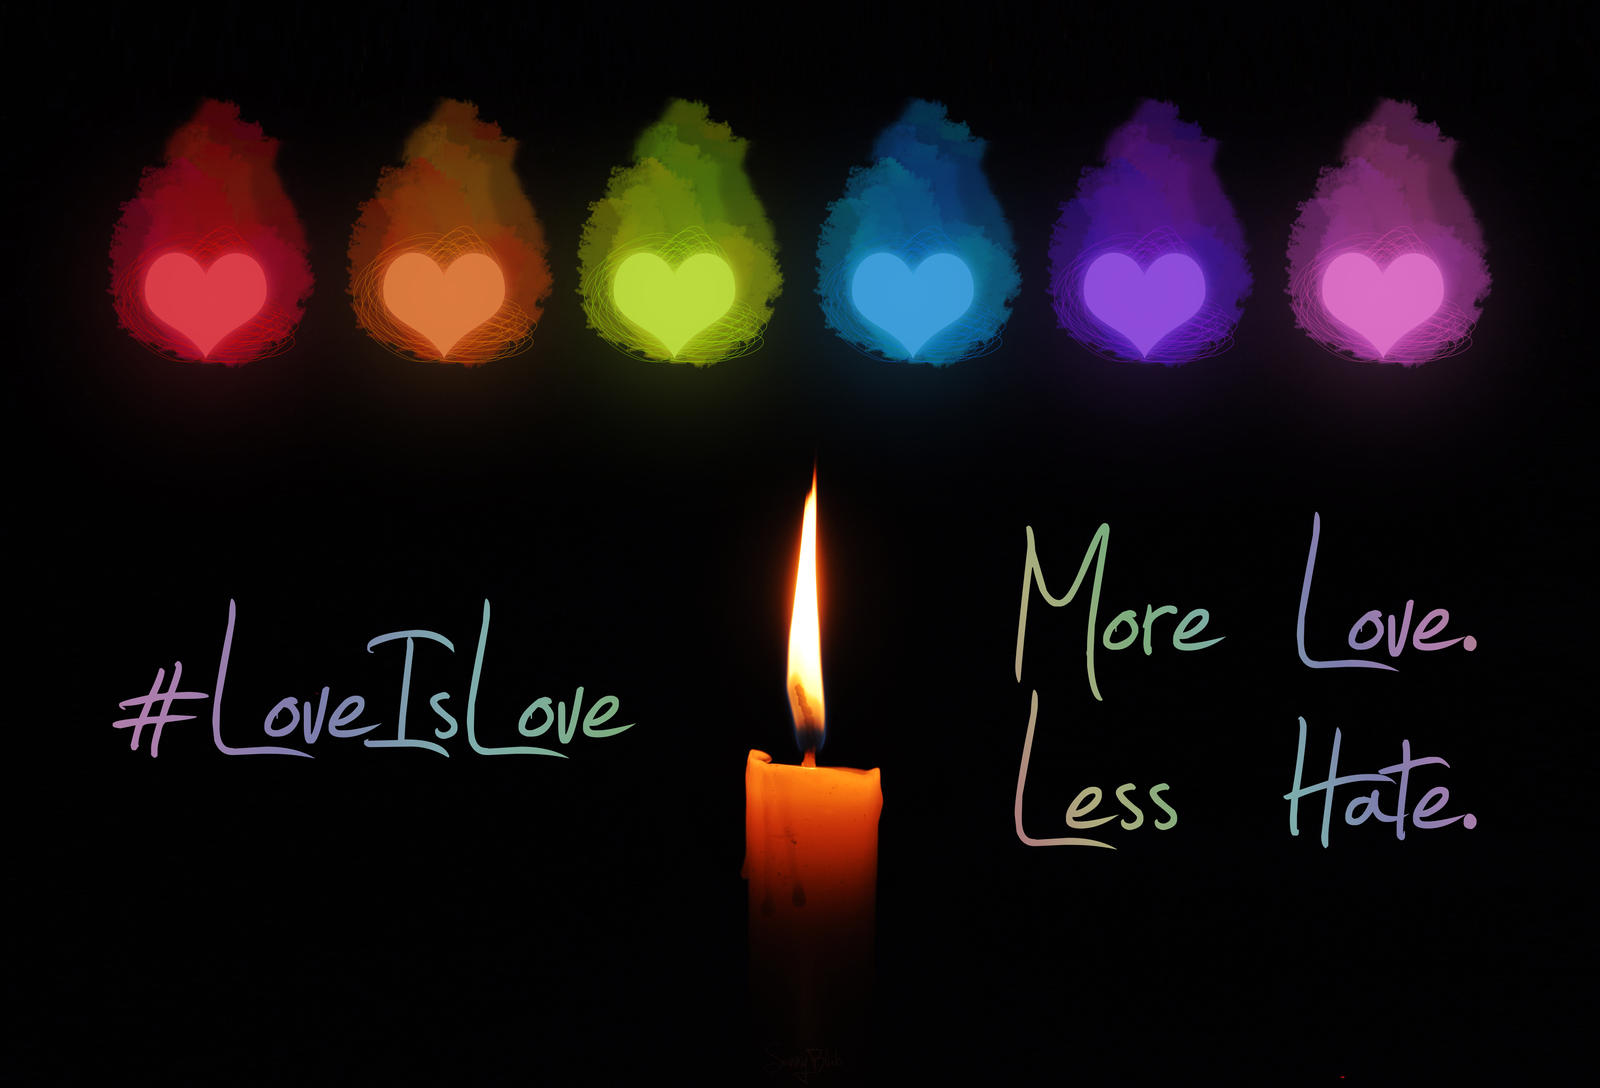 #LoveIsLove by SunnyBlub